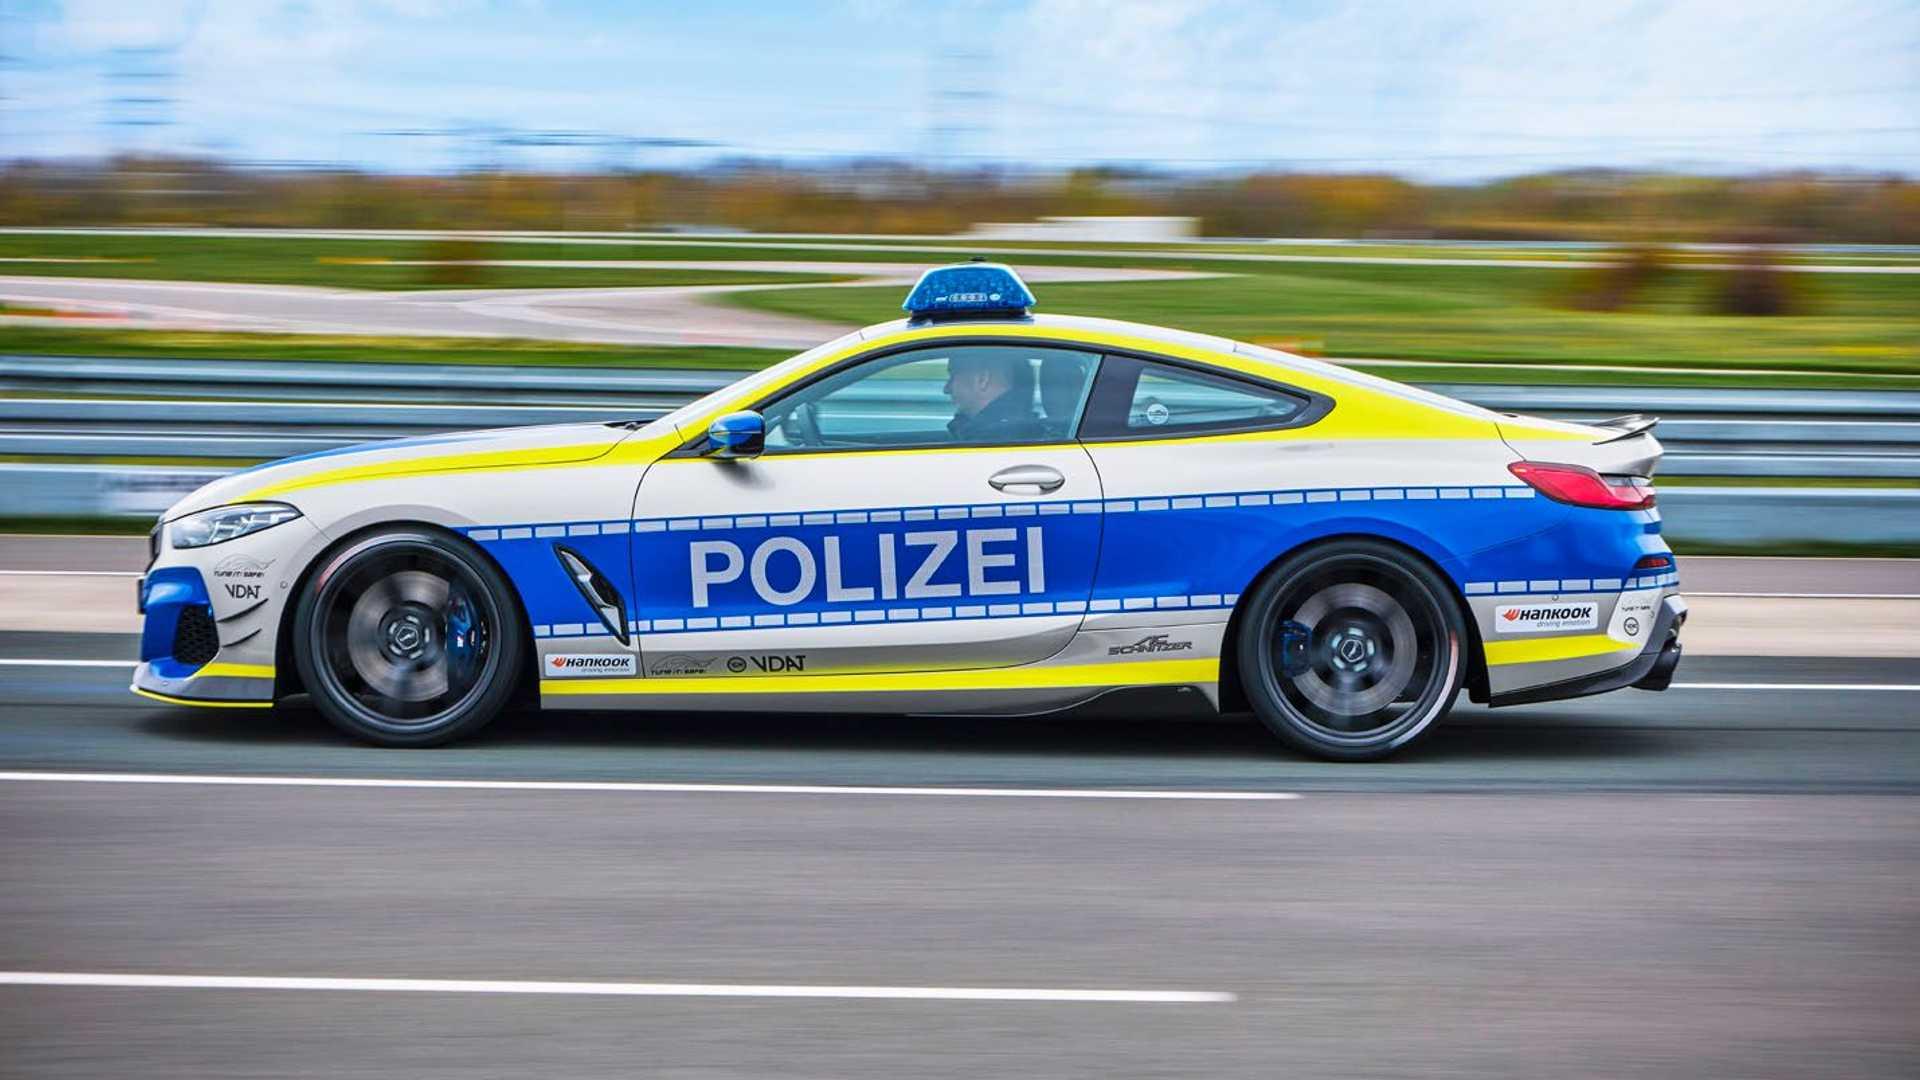 BMW-M850i-police-car-tune-it-safe-23